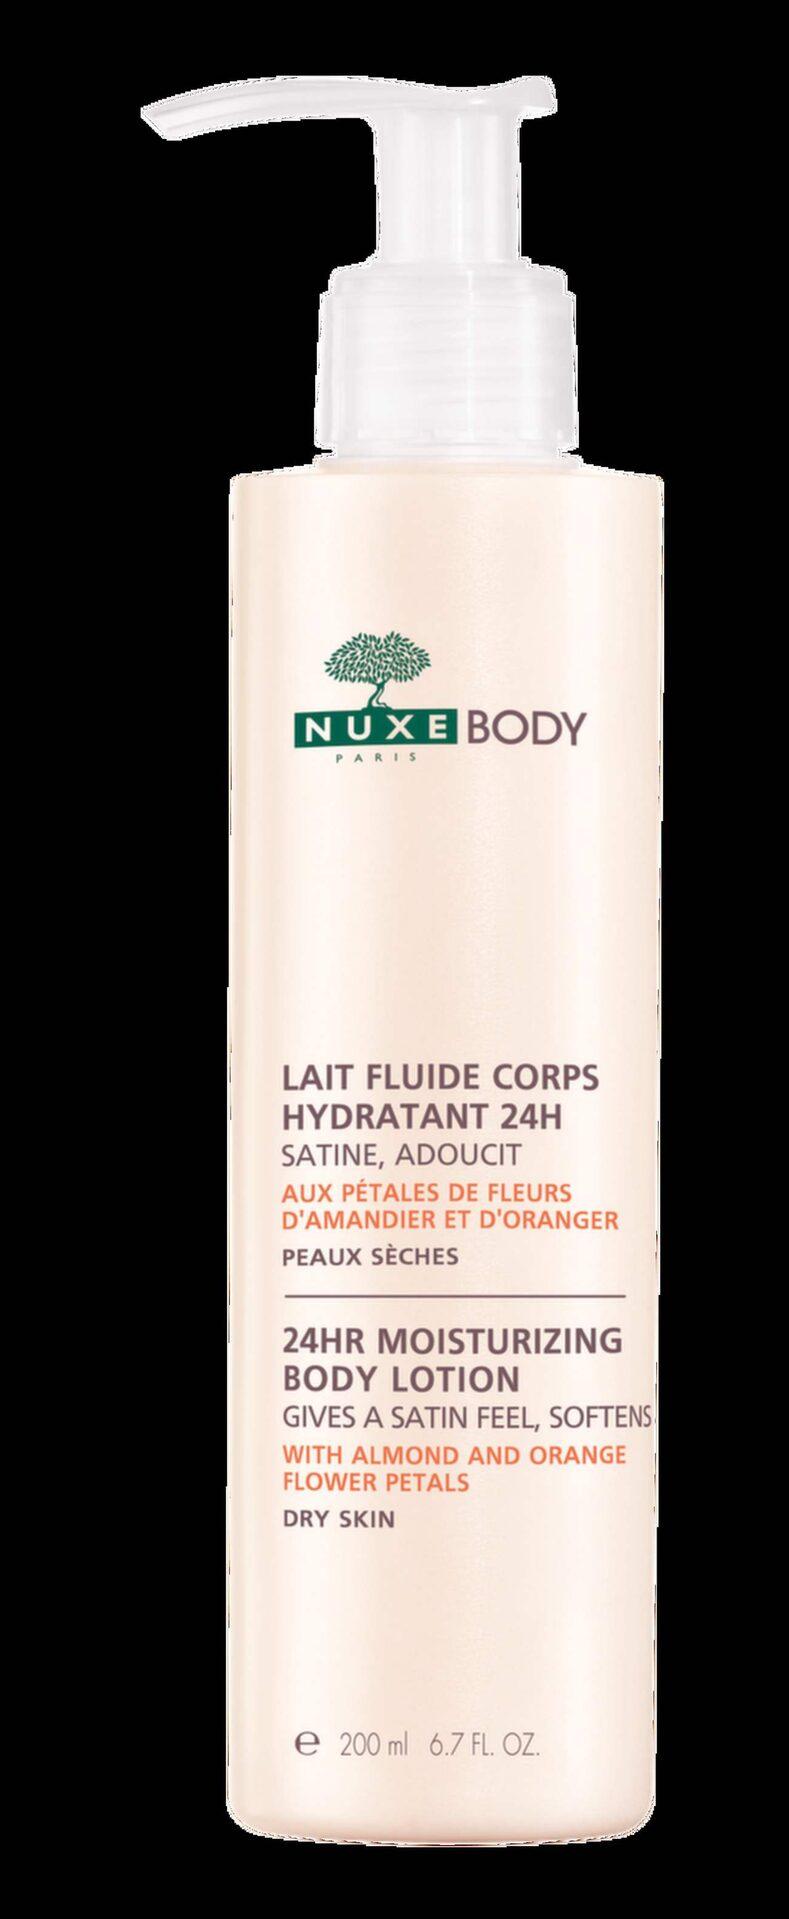 Mjukgörande. Ge kroppen vad den behöver. Body lotion, 225 kr, Nuxe/Eleven.se.